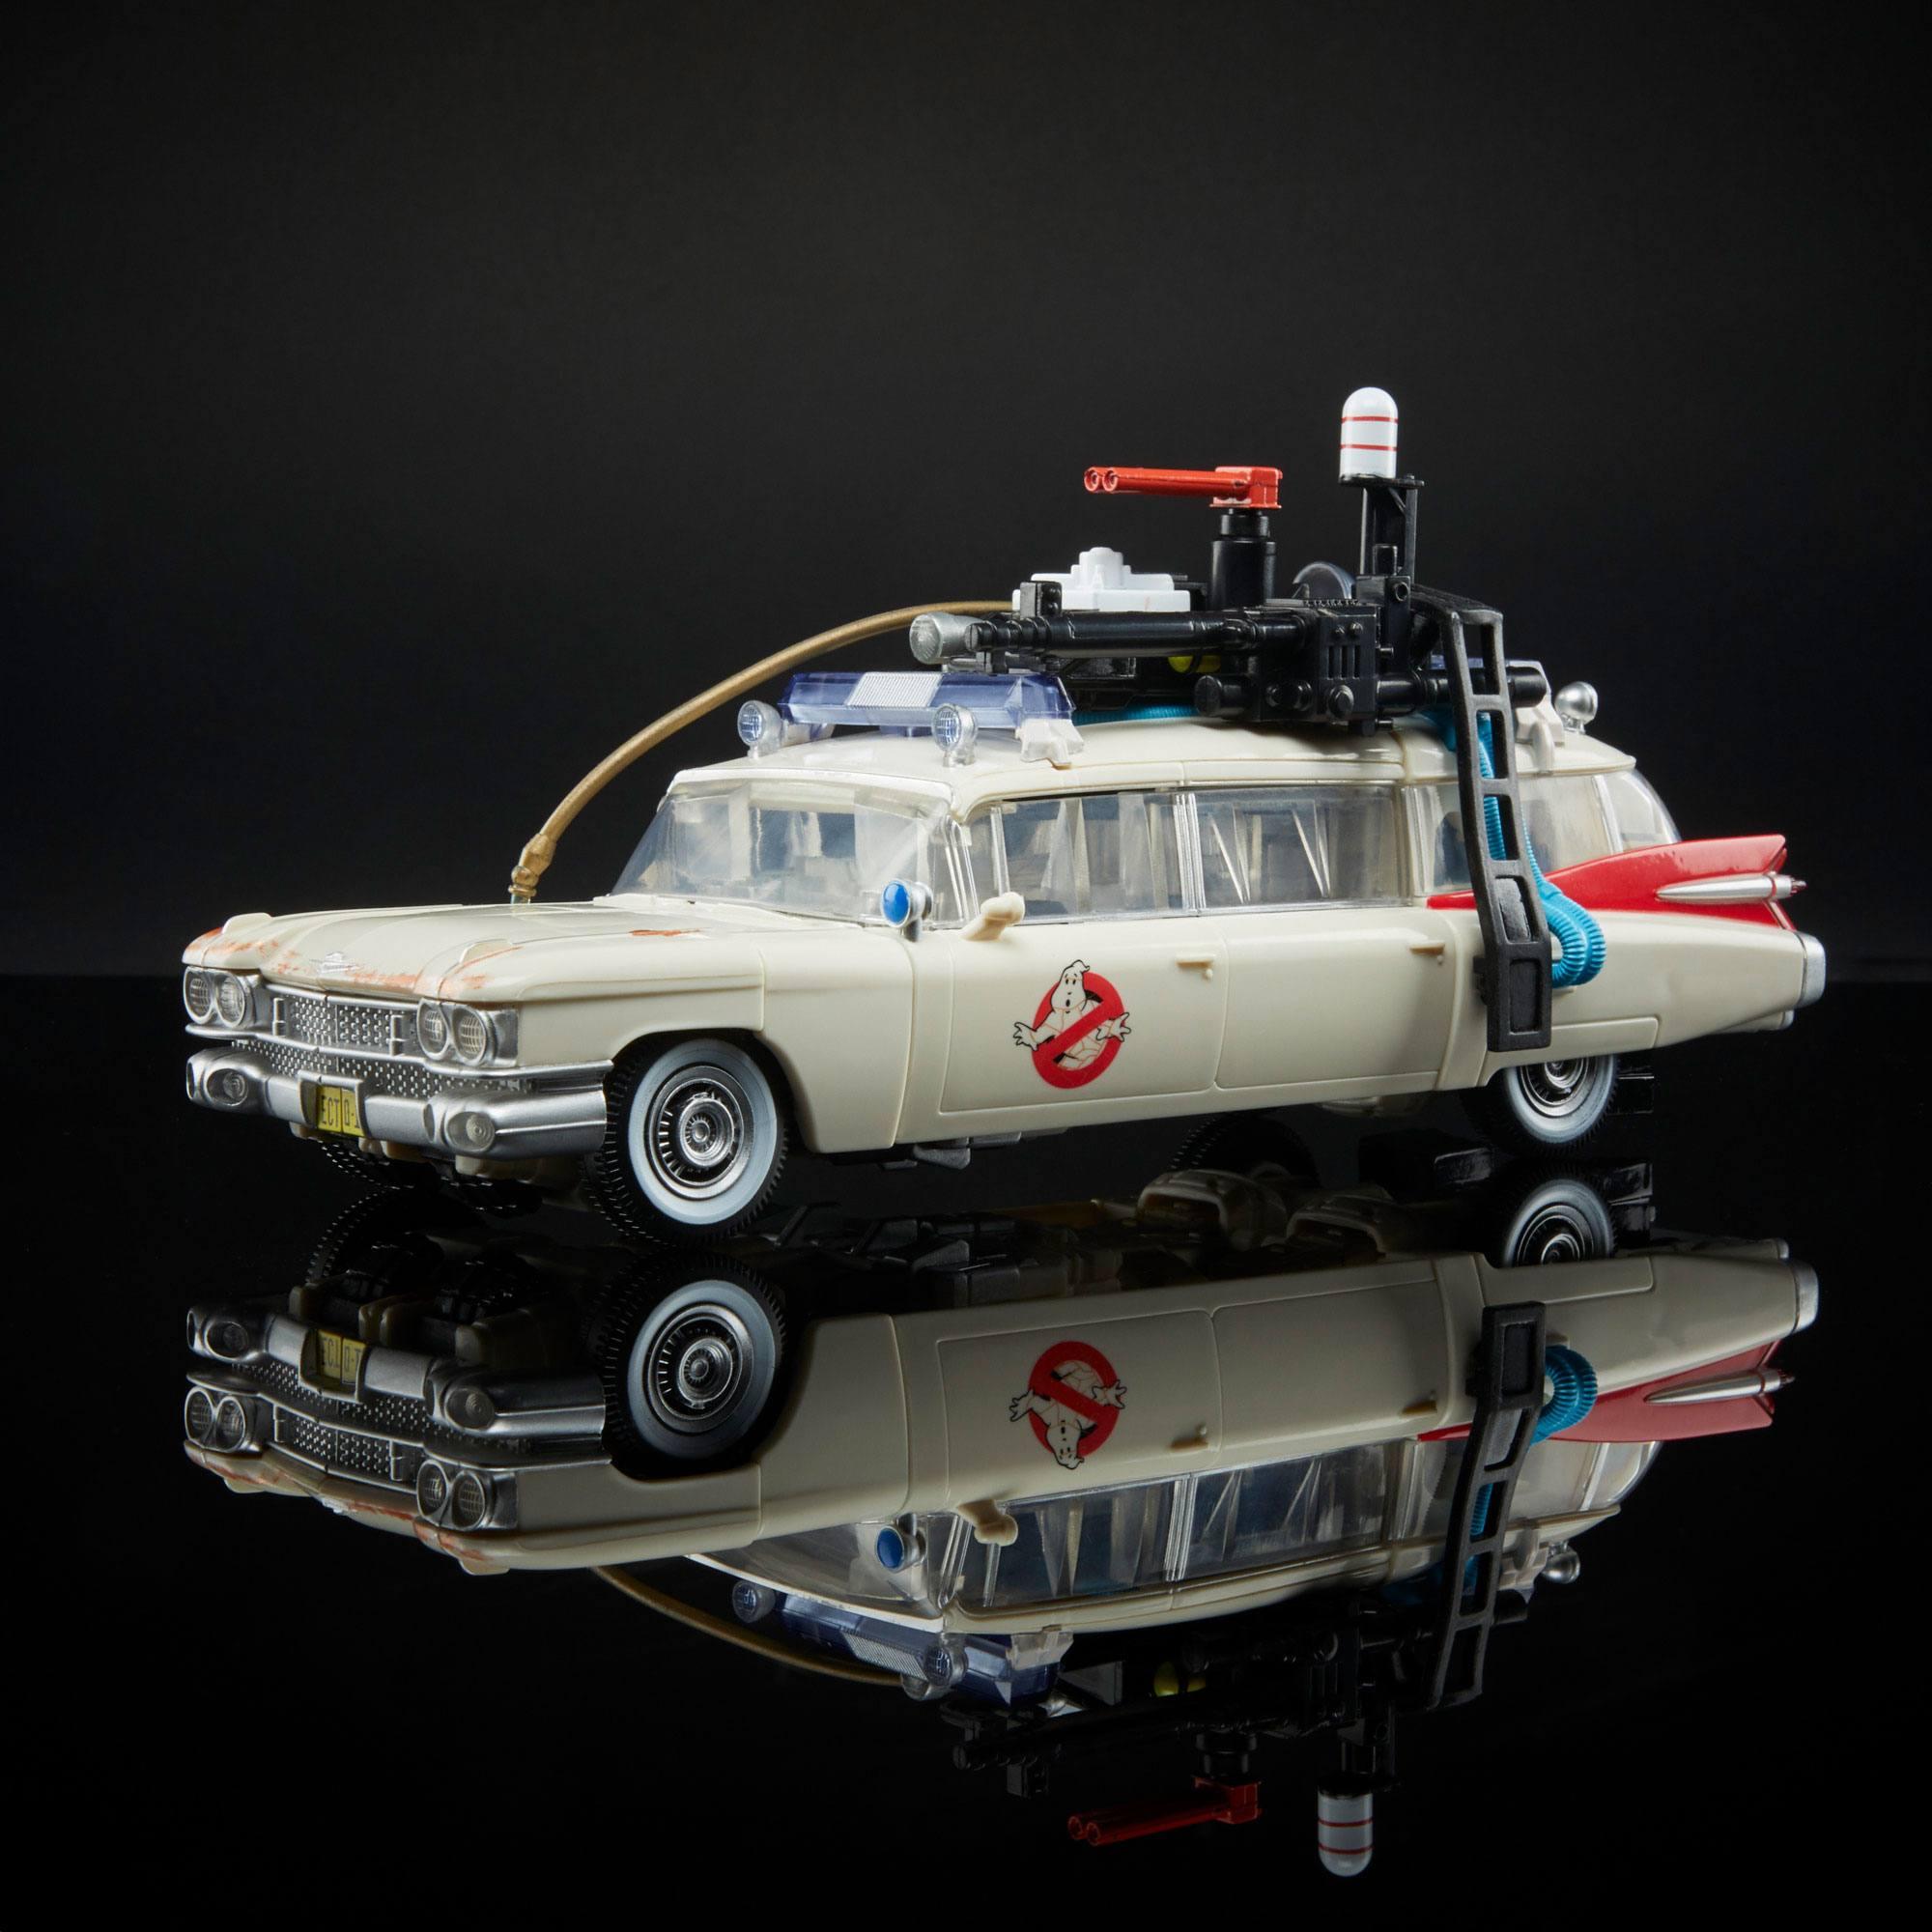 Transformers x Ghostbusters: Legacy Fahrzeug Ecto-1 E95565E00 5010993839940